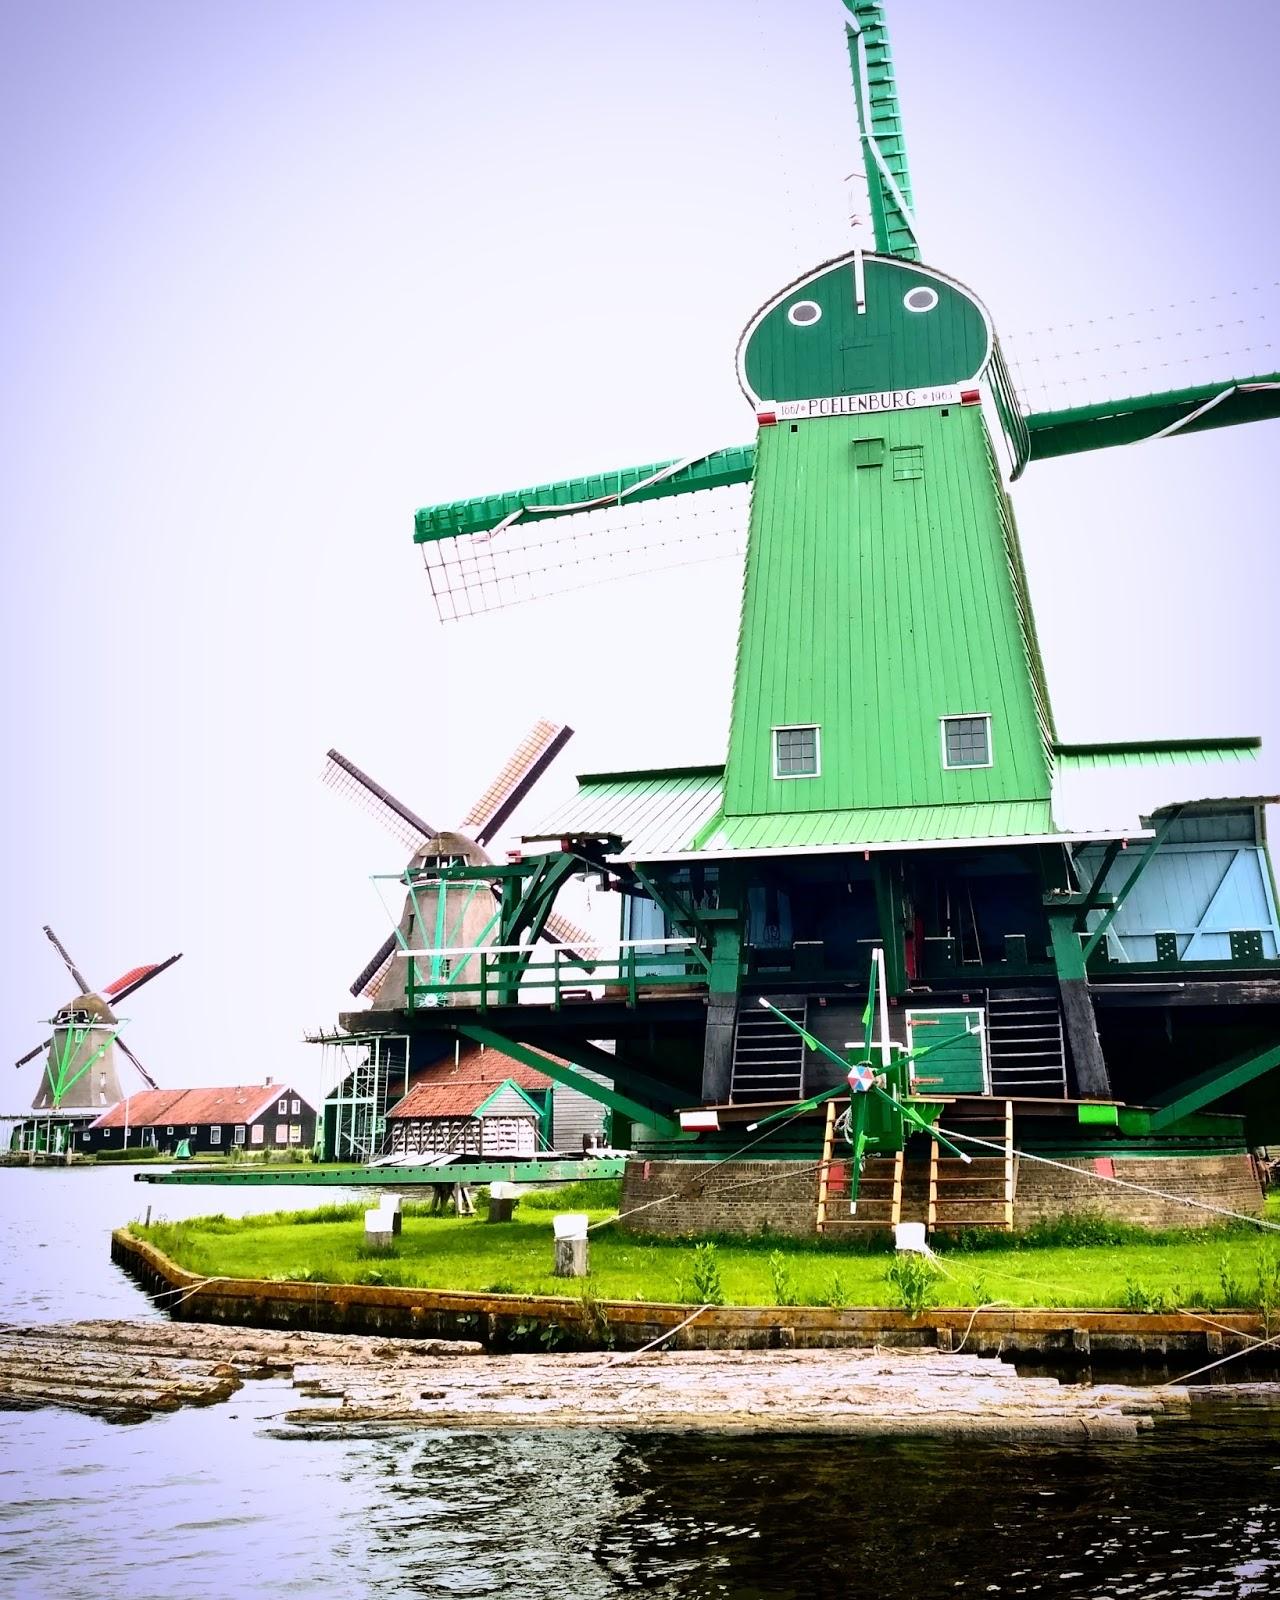 Mengapa Belanda Disebut Negara Kincir Angin : mengapa, belanda, disebut, negara, kincir, angin, Diary, Putri, Hatice